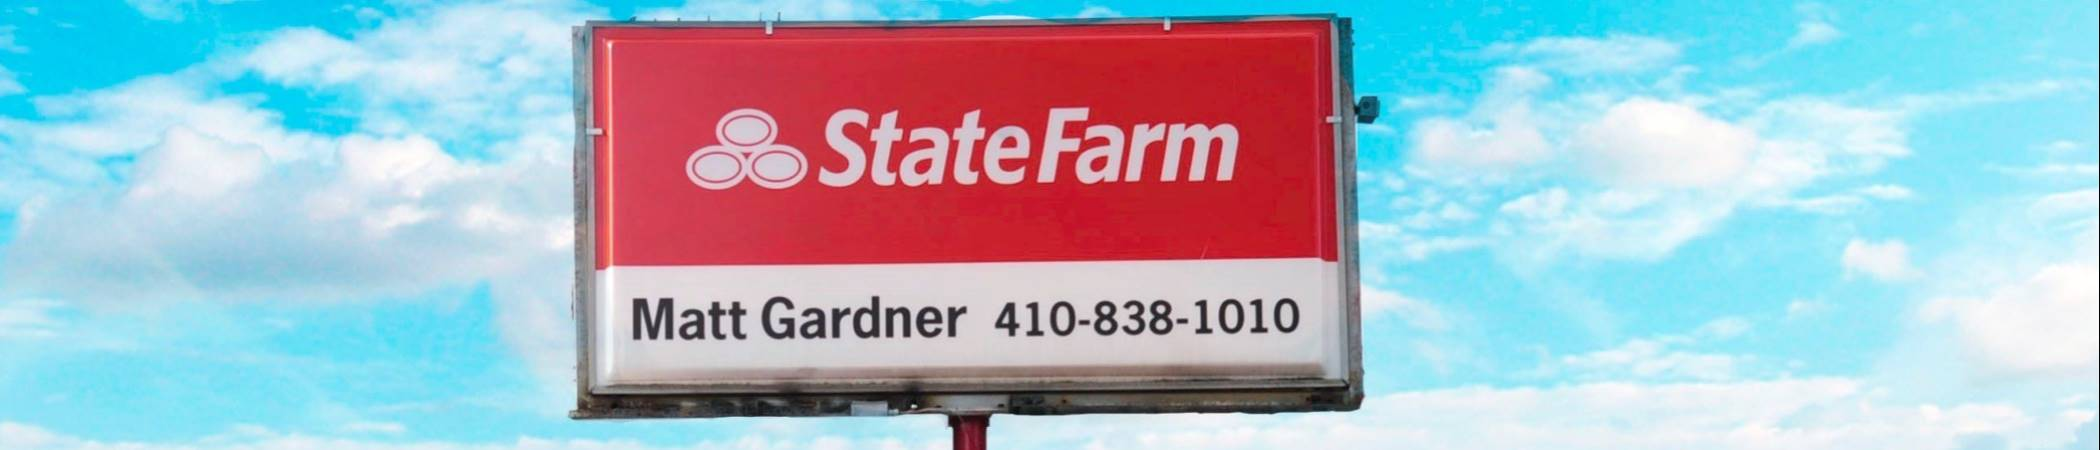 Matt Gardner State Farm Insurance in Bel Air, MD | Home, Auto Insurance & more